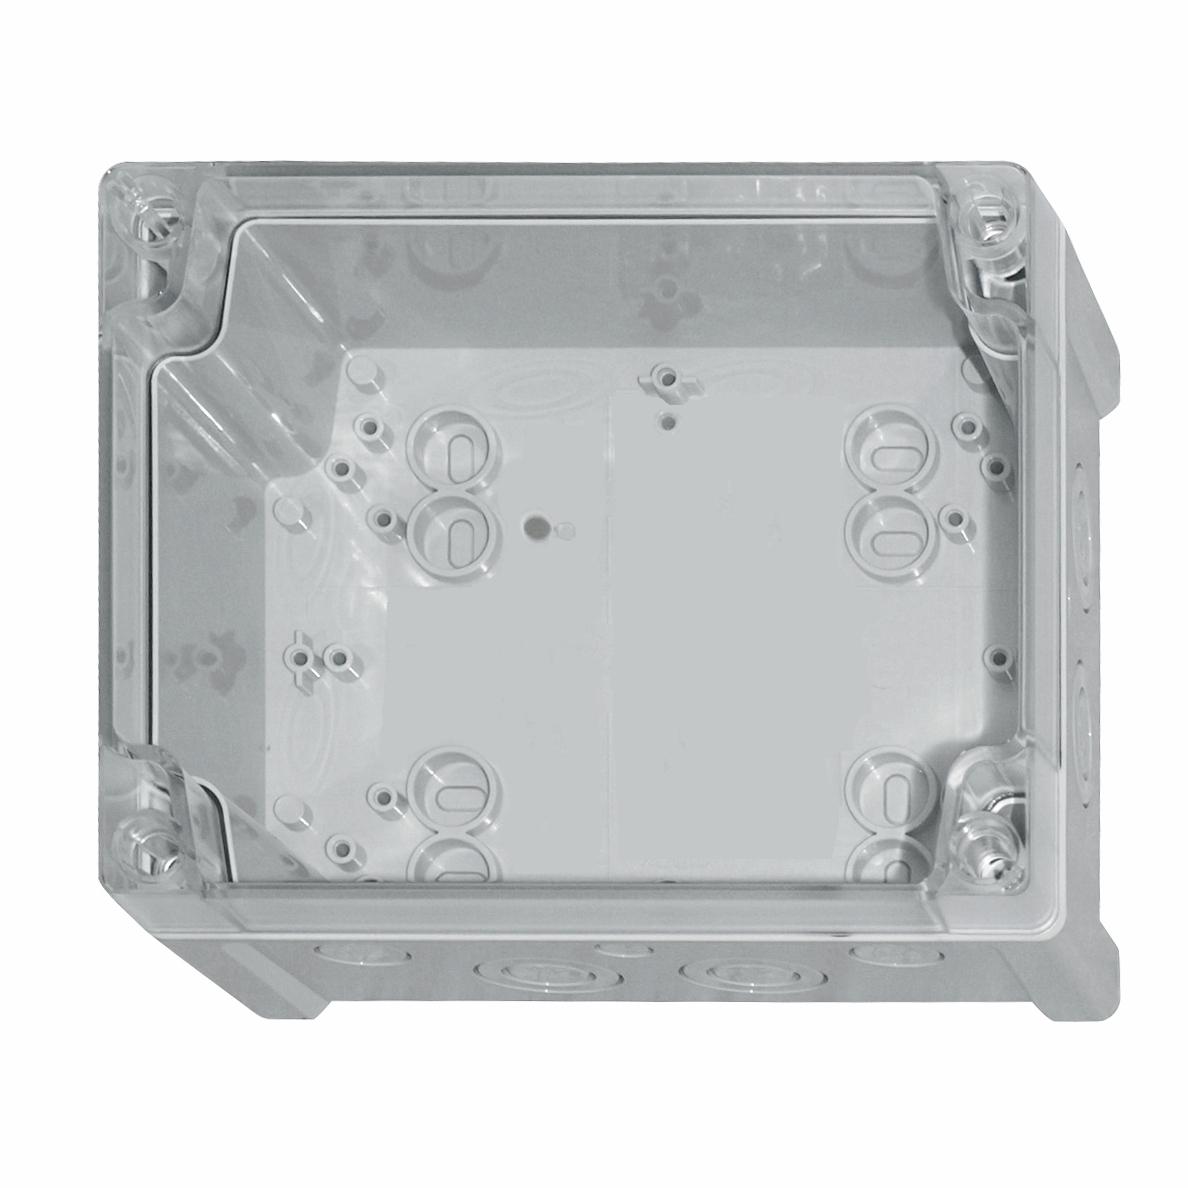 1 Stk ABS Gehäuse+Deckel transp.m.Scharnier, 240x191x107mm,RAL7035 IG707016--